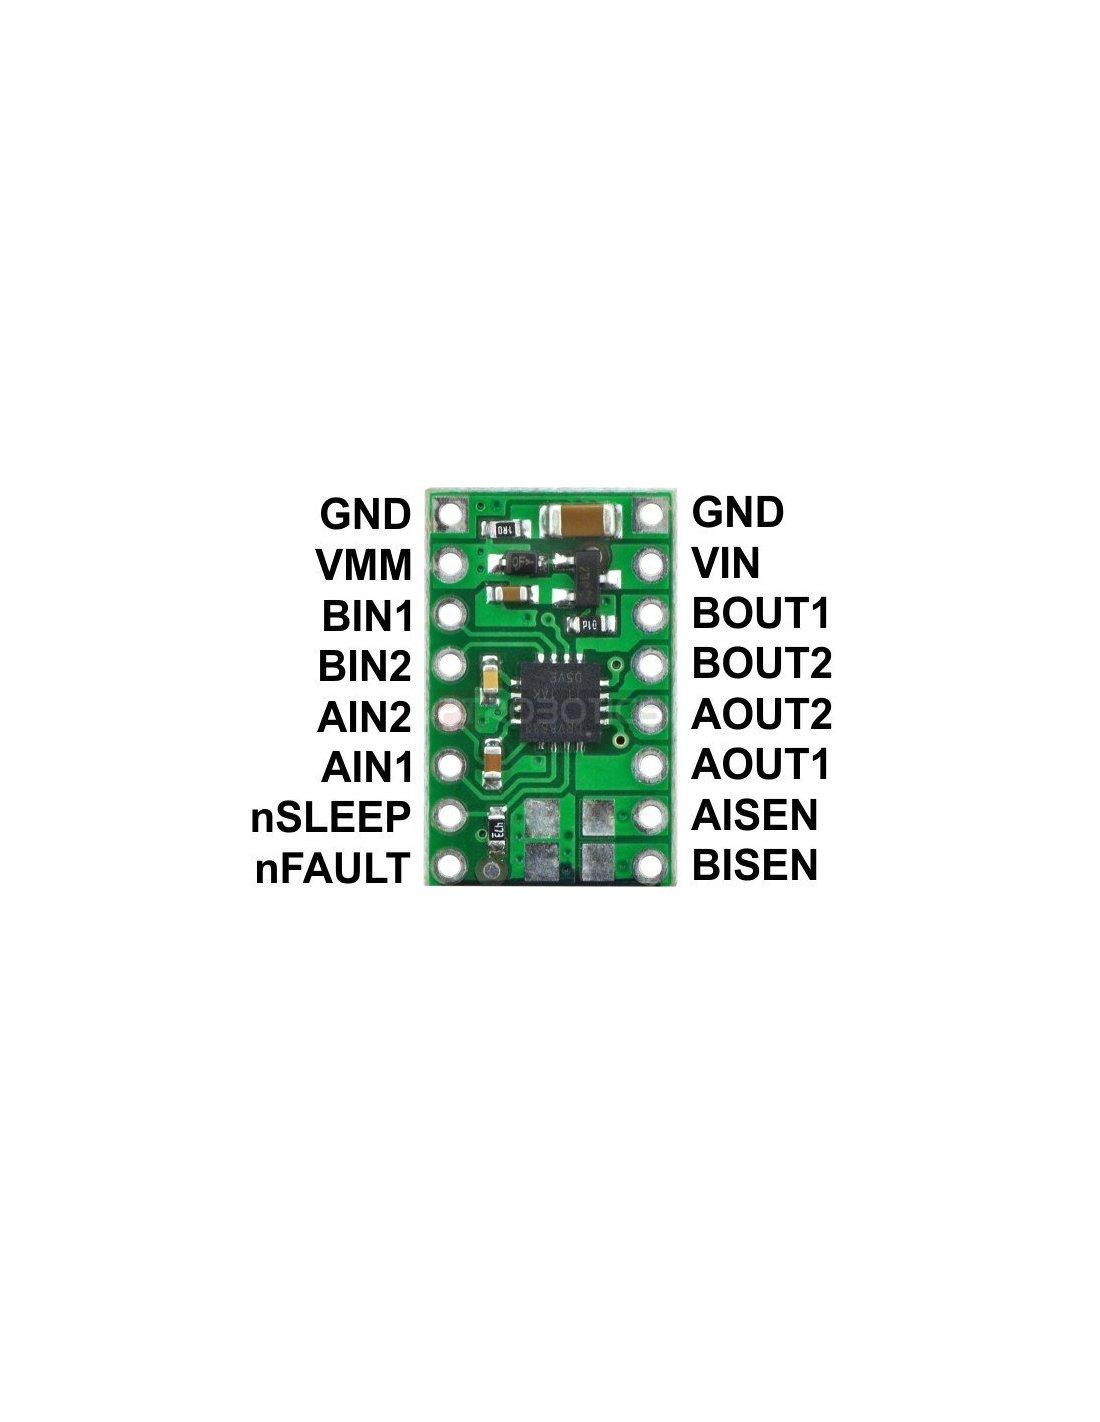 Motor Driver / Control : DRV8833 Dual Motor Driver Carrier